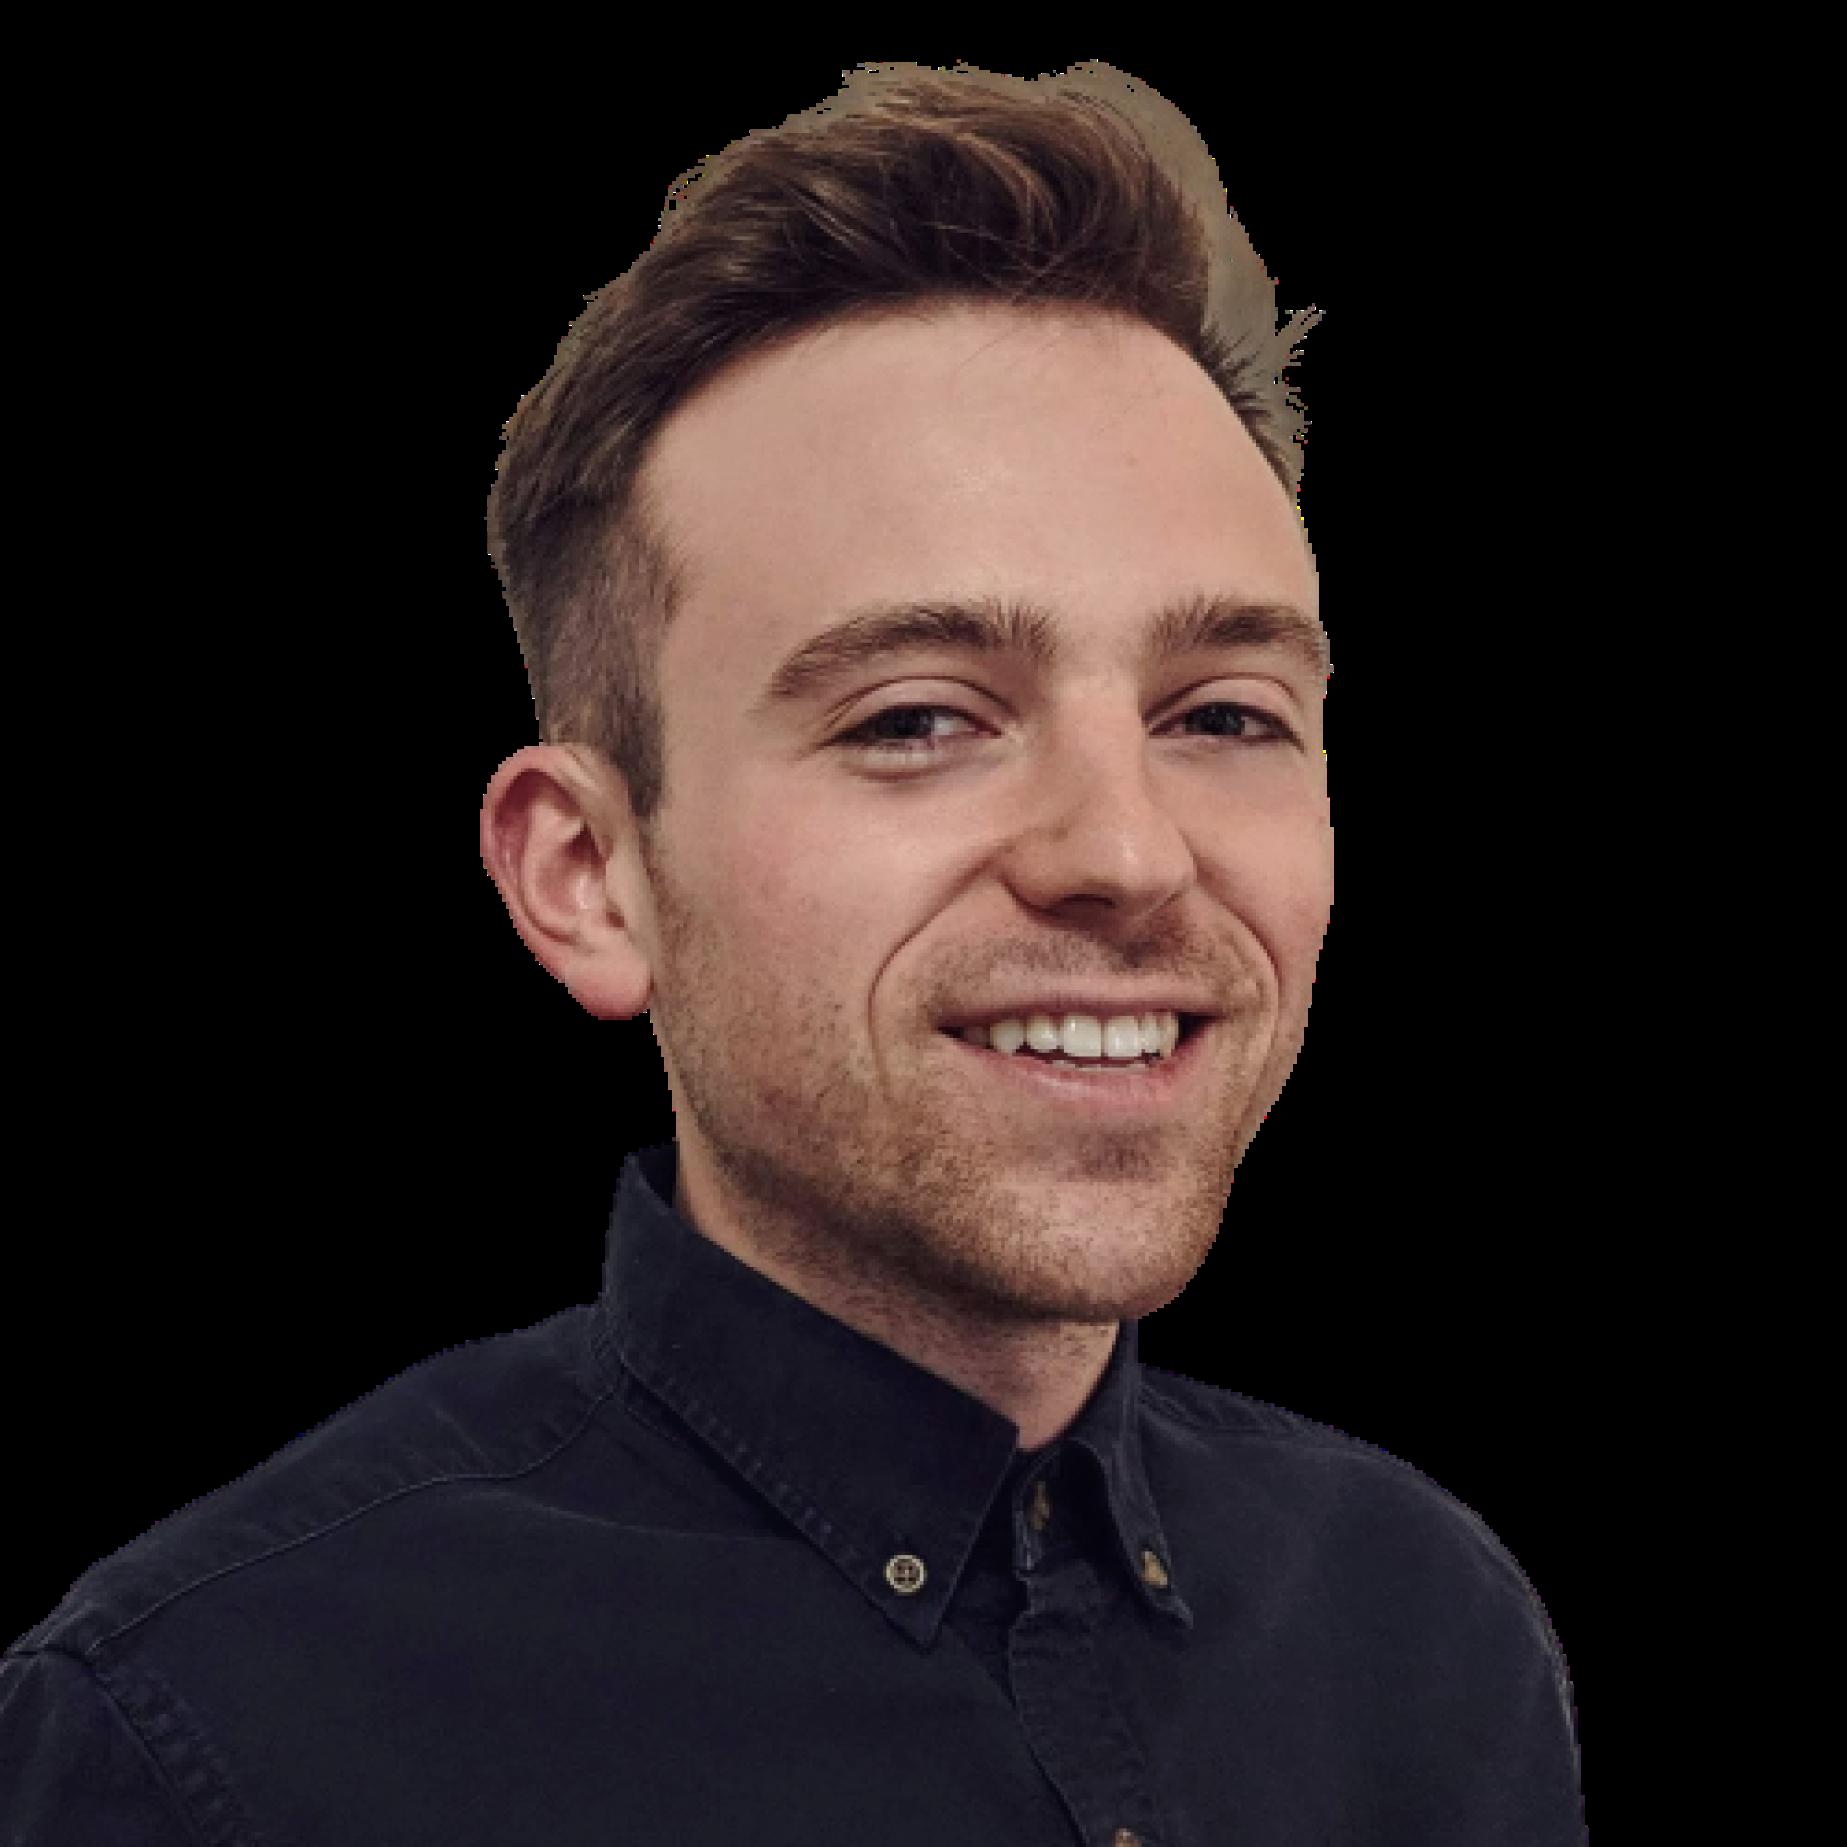 A snazzy profile photo of Jesse